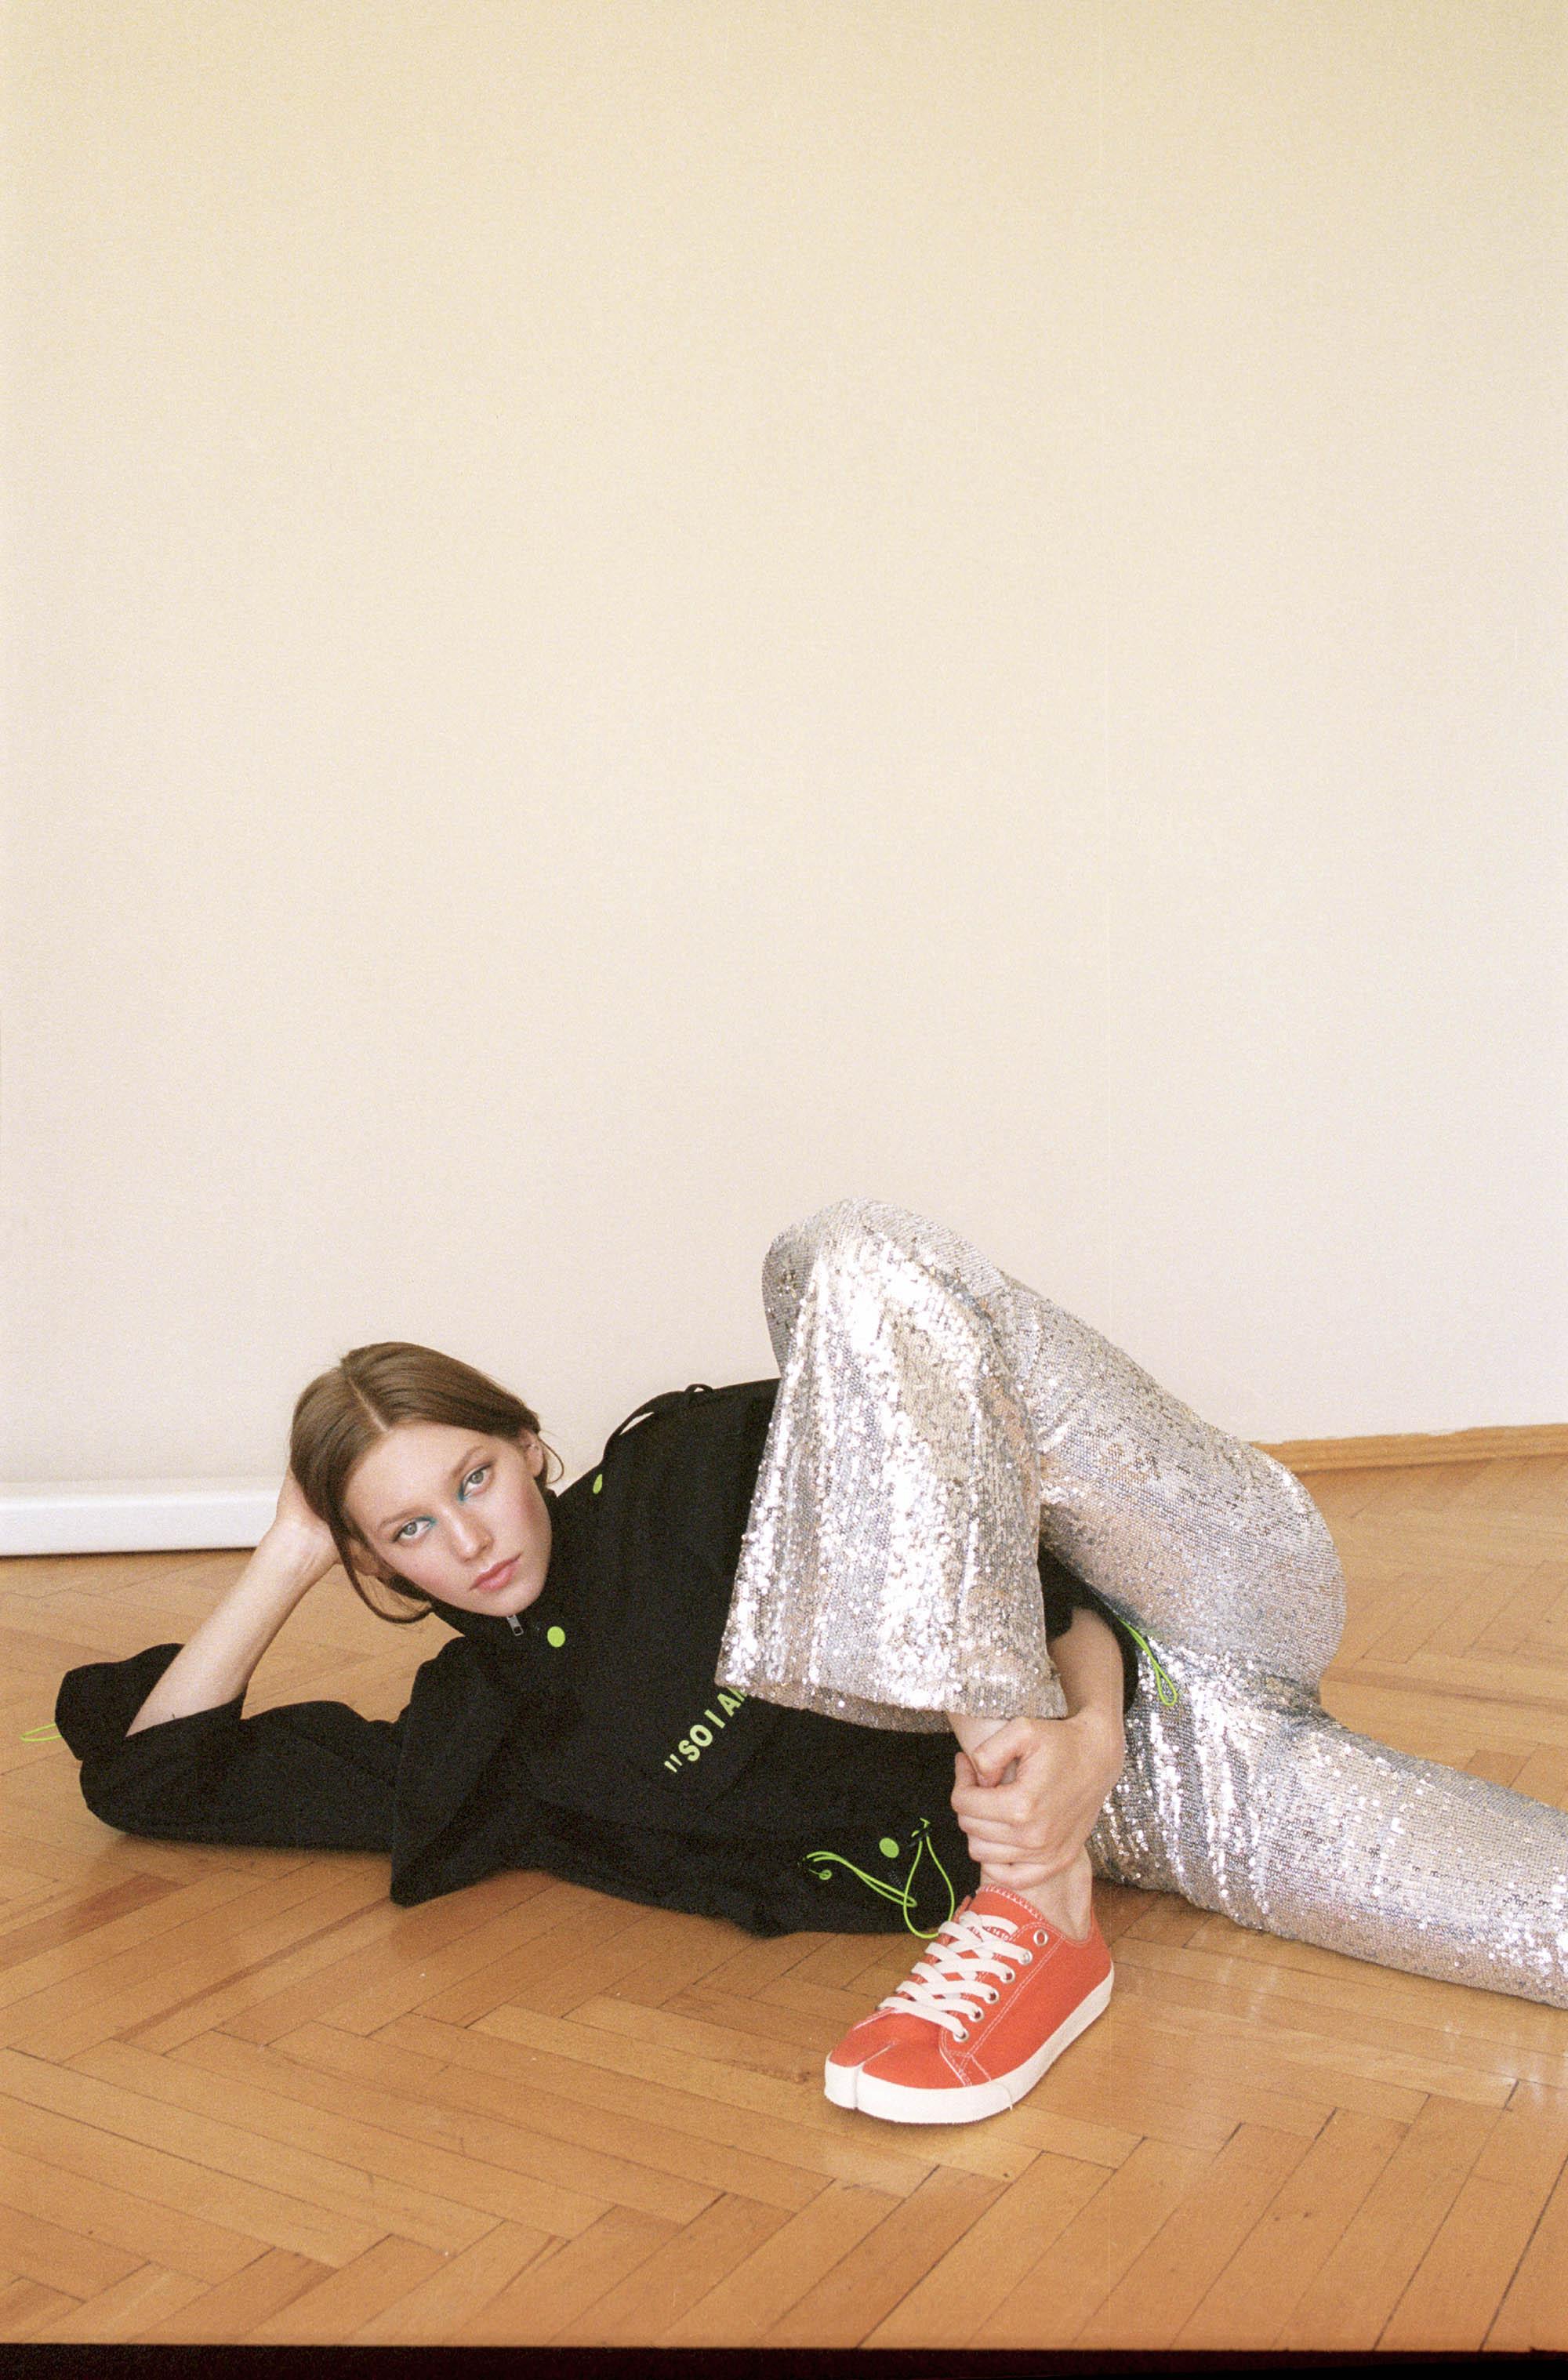 Jacket  Anna Kiki  Trousers stylist's own Shoes  Maison Margiela